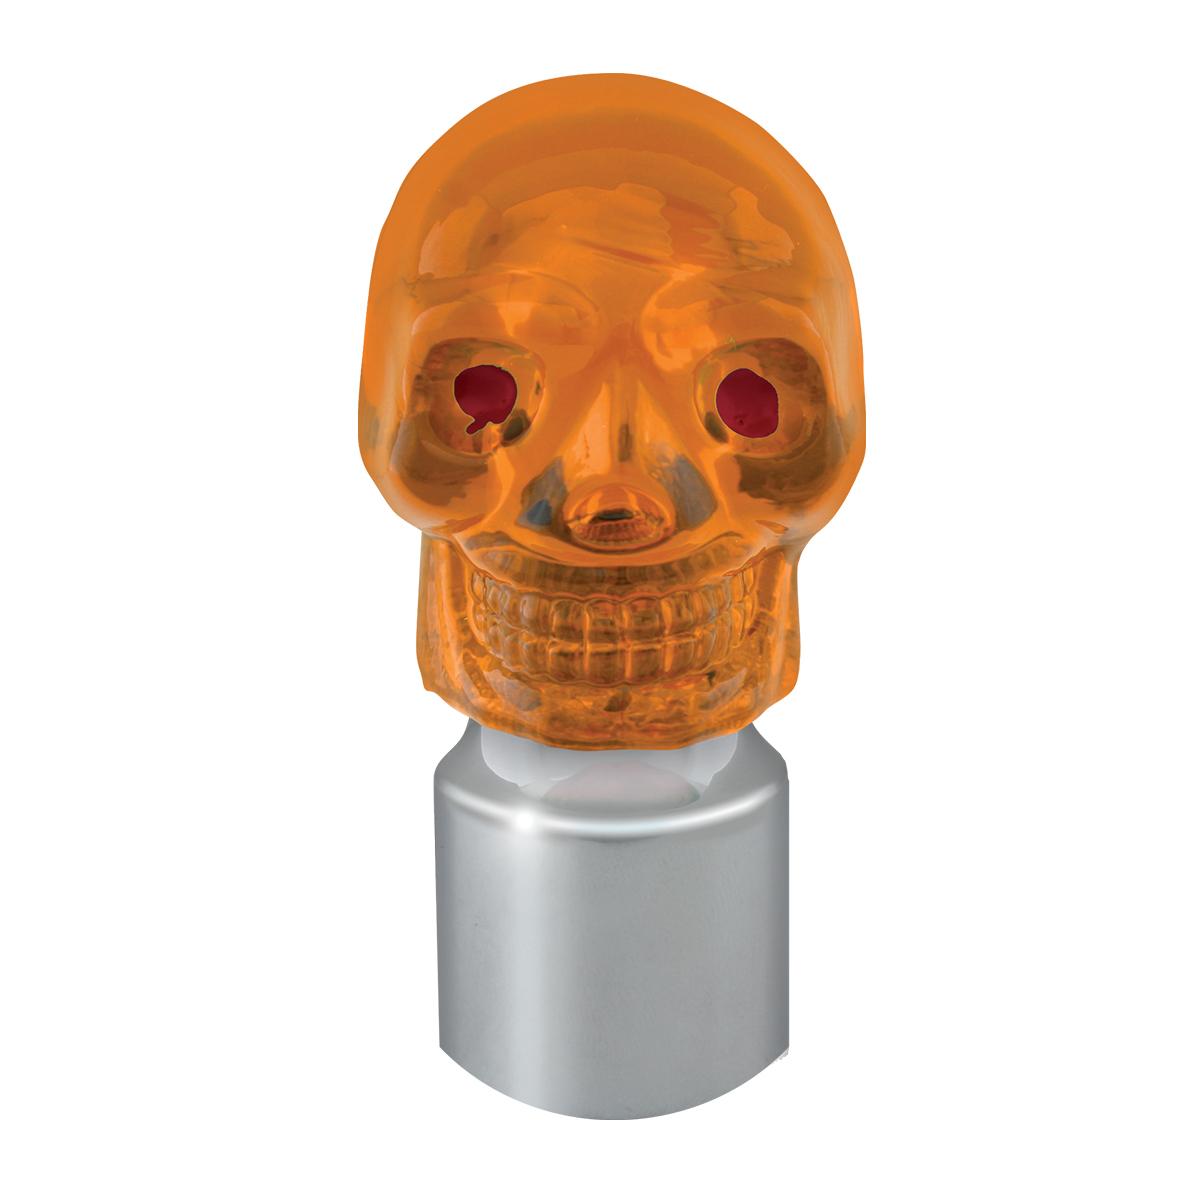 "94666 Lighted Bumper Guides 1"" Dia. x 51"" (L) in Skull Style for Plastic Bumper"